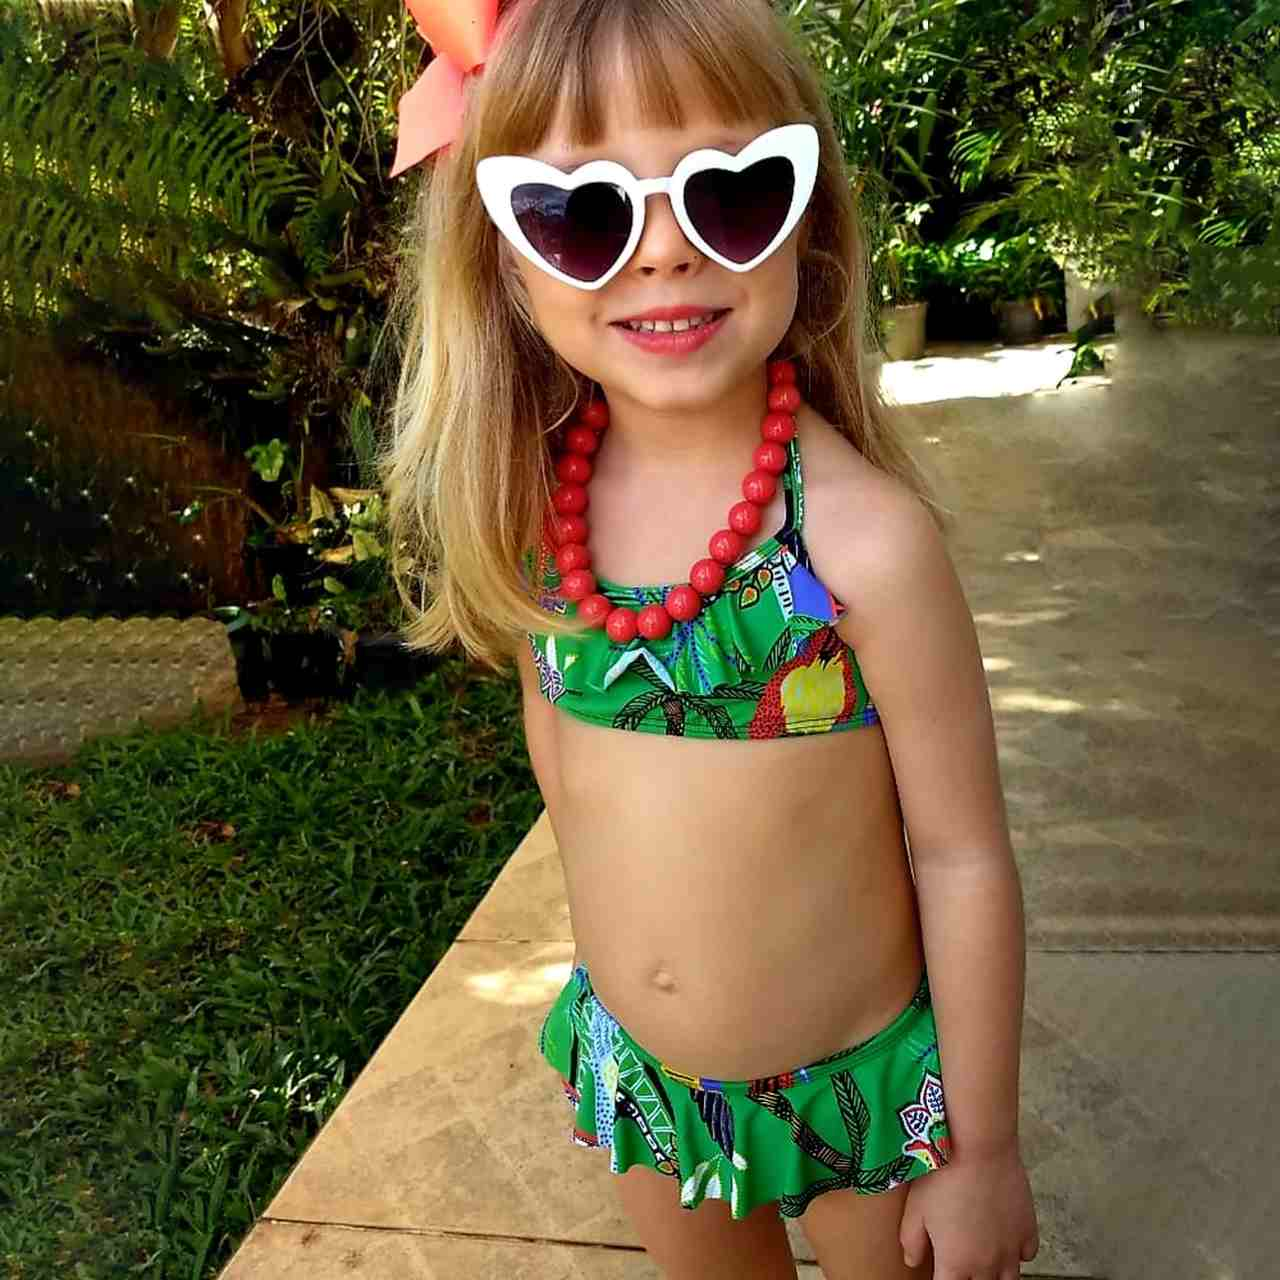 Biquíni Top Com Babados Infantil Cuba Verde 9441 De Chelles